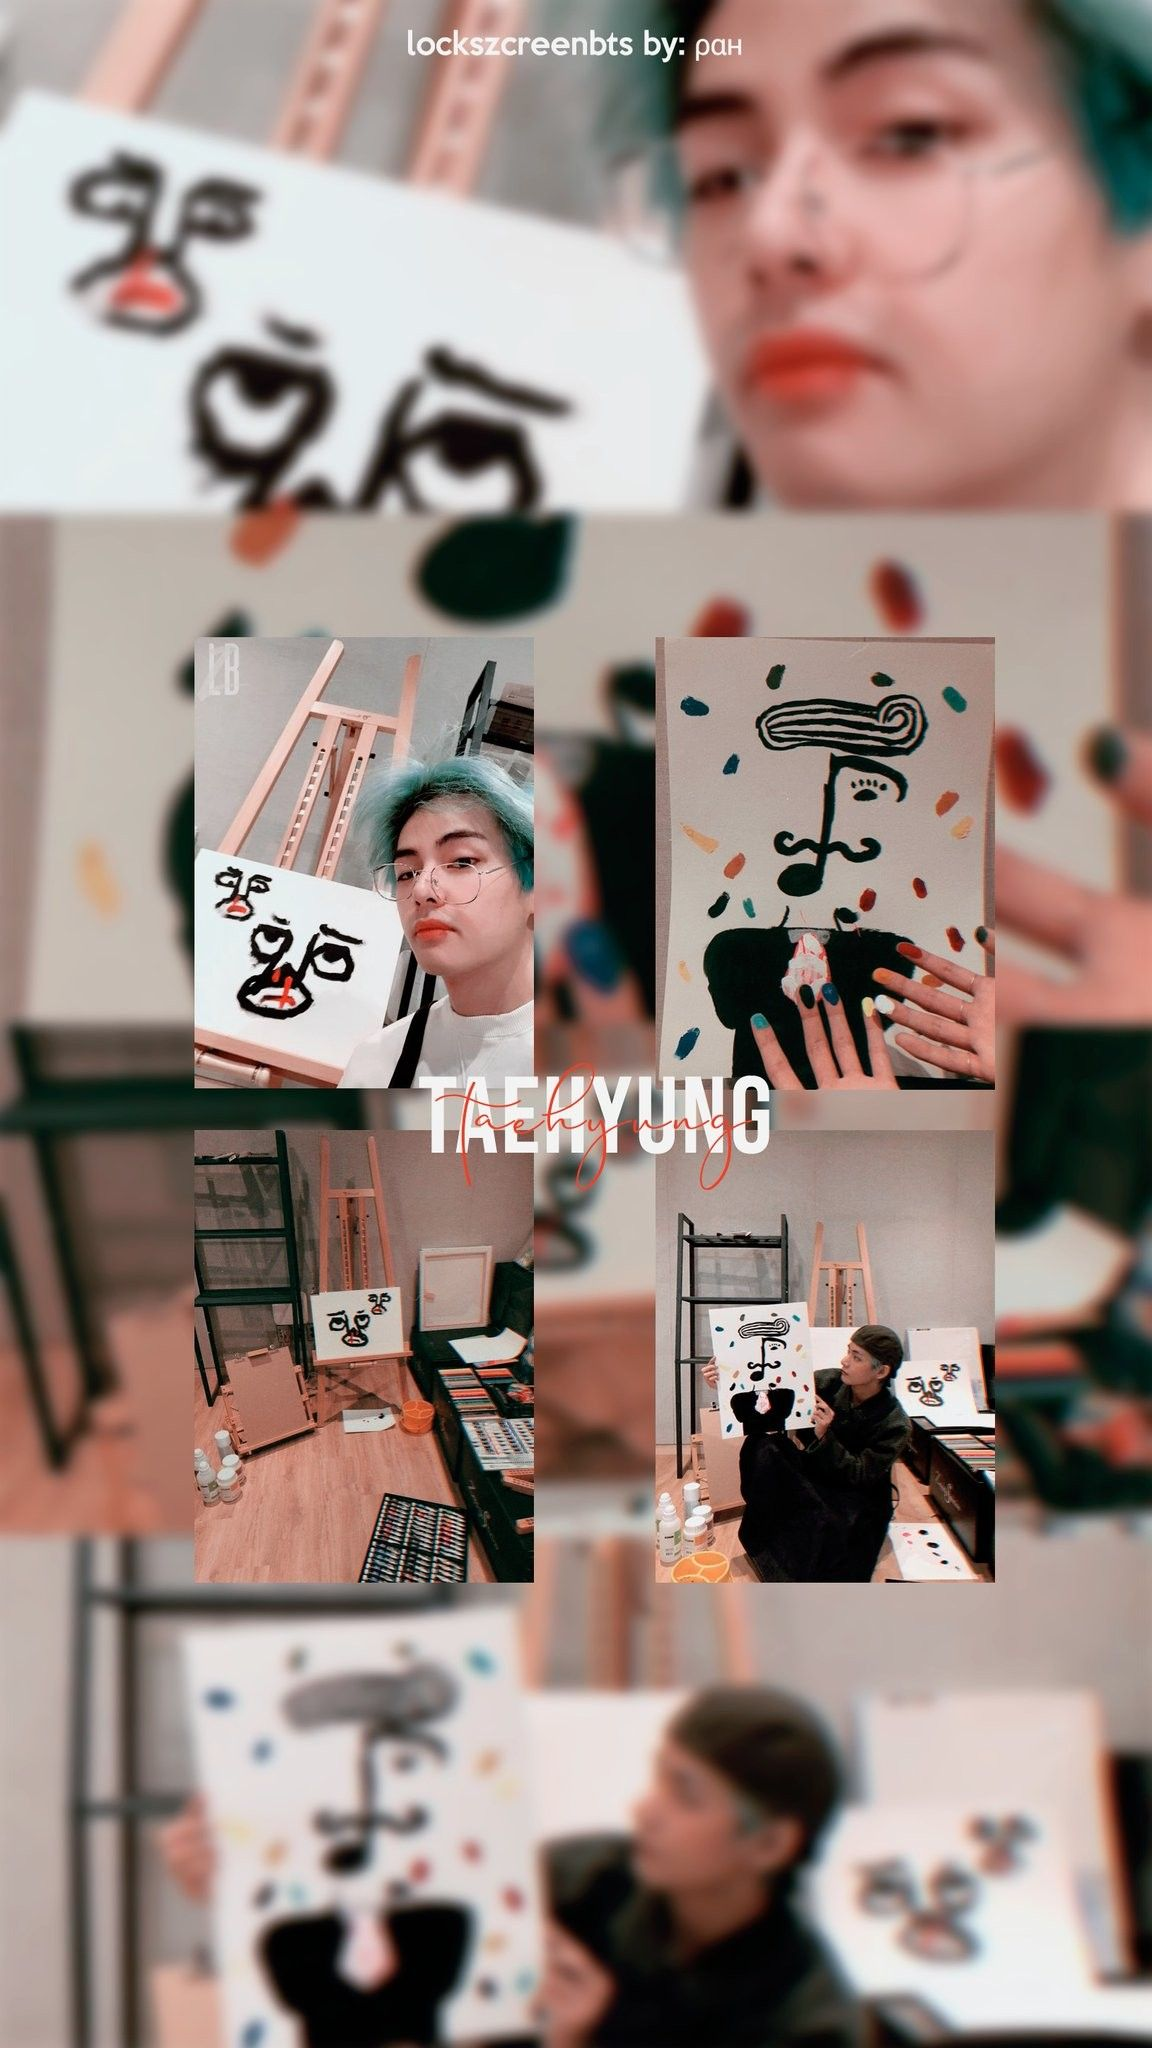 Lockscreen Bts On Twitter Kim Taehyung Wallpaper Kim Taehyung Bts Wallpaper Aesthetic lockscreen bts v wallpaper